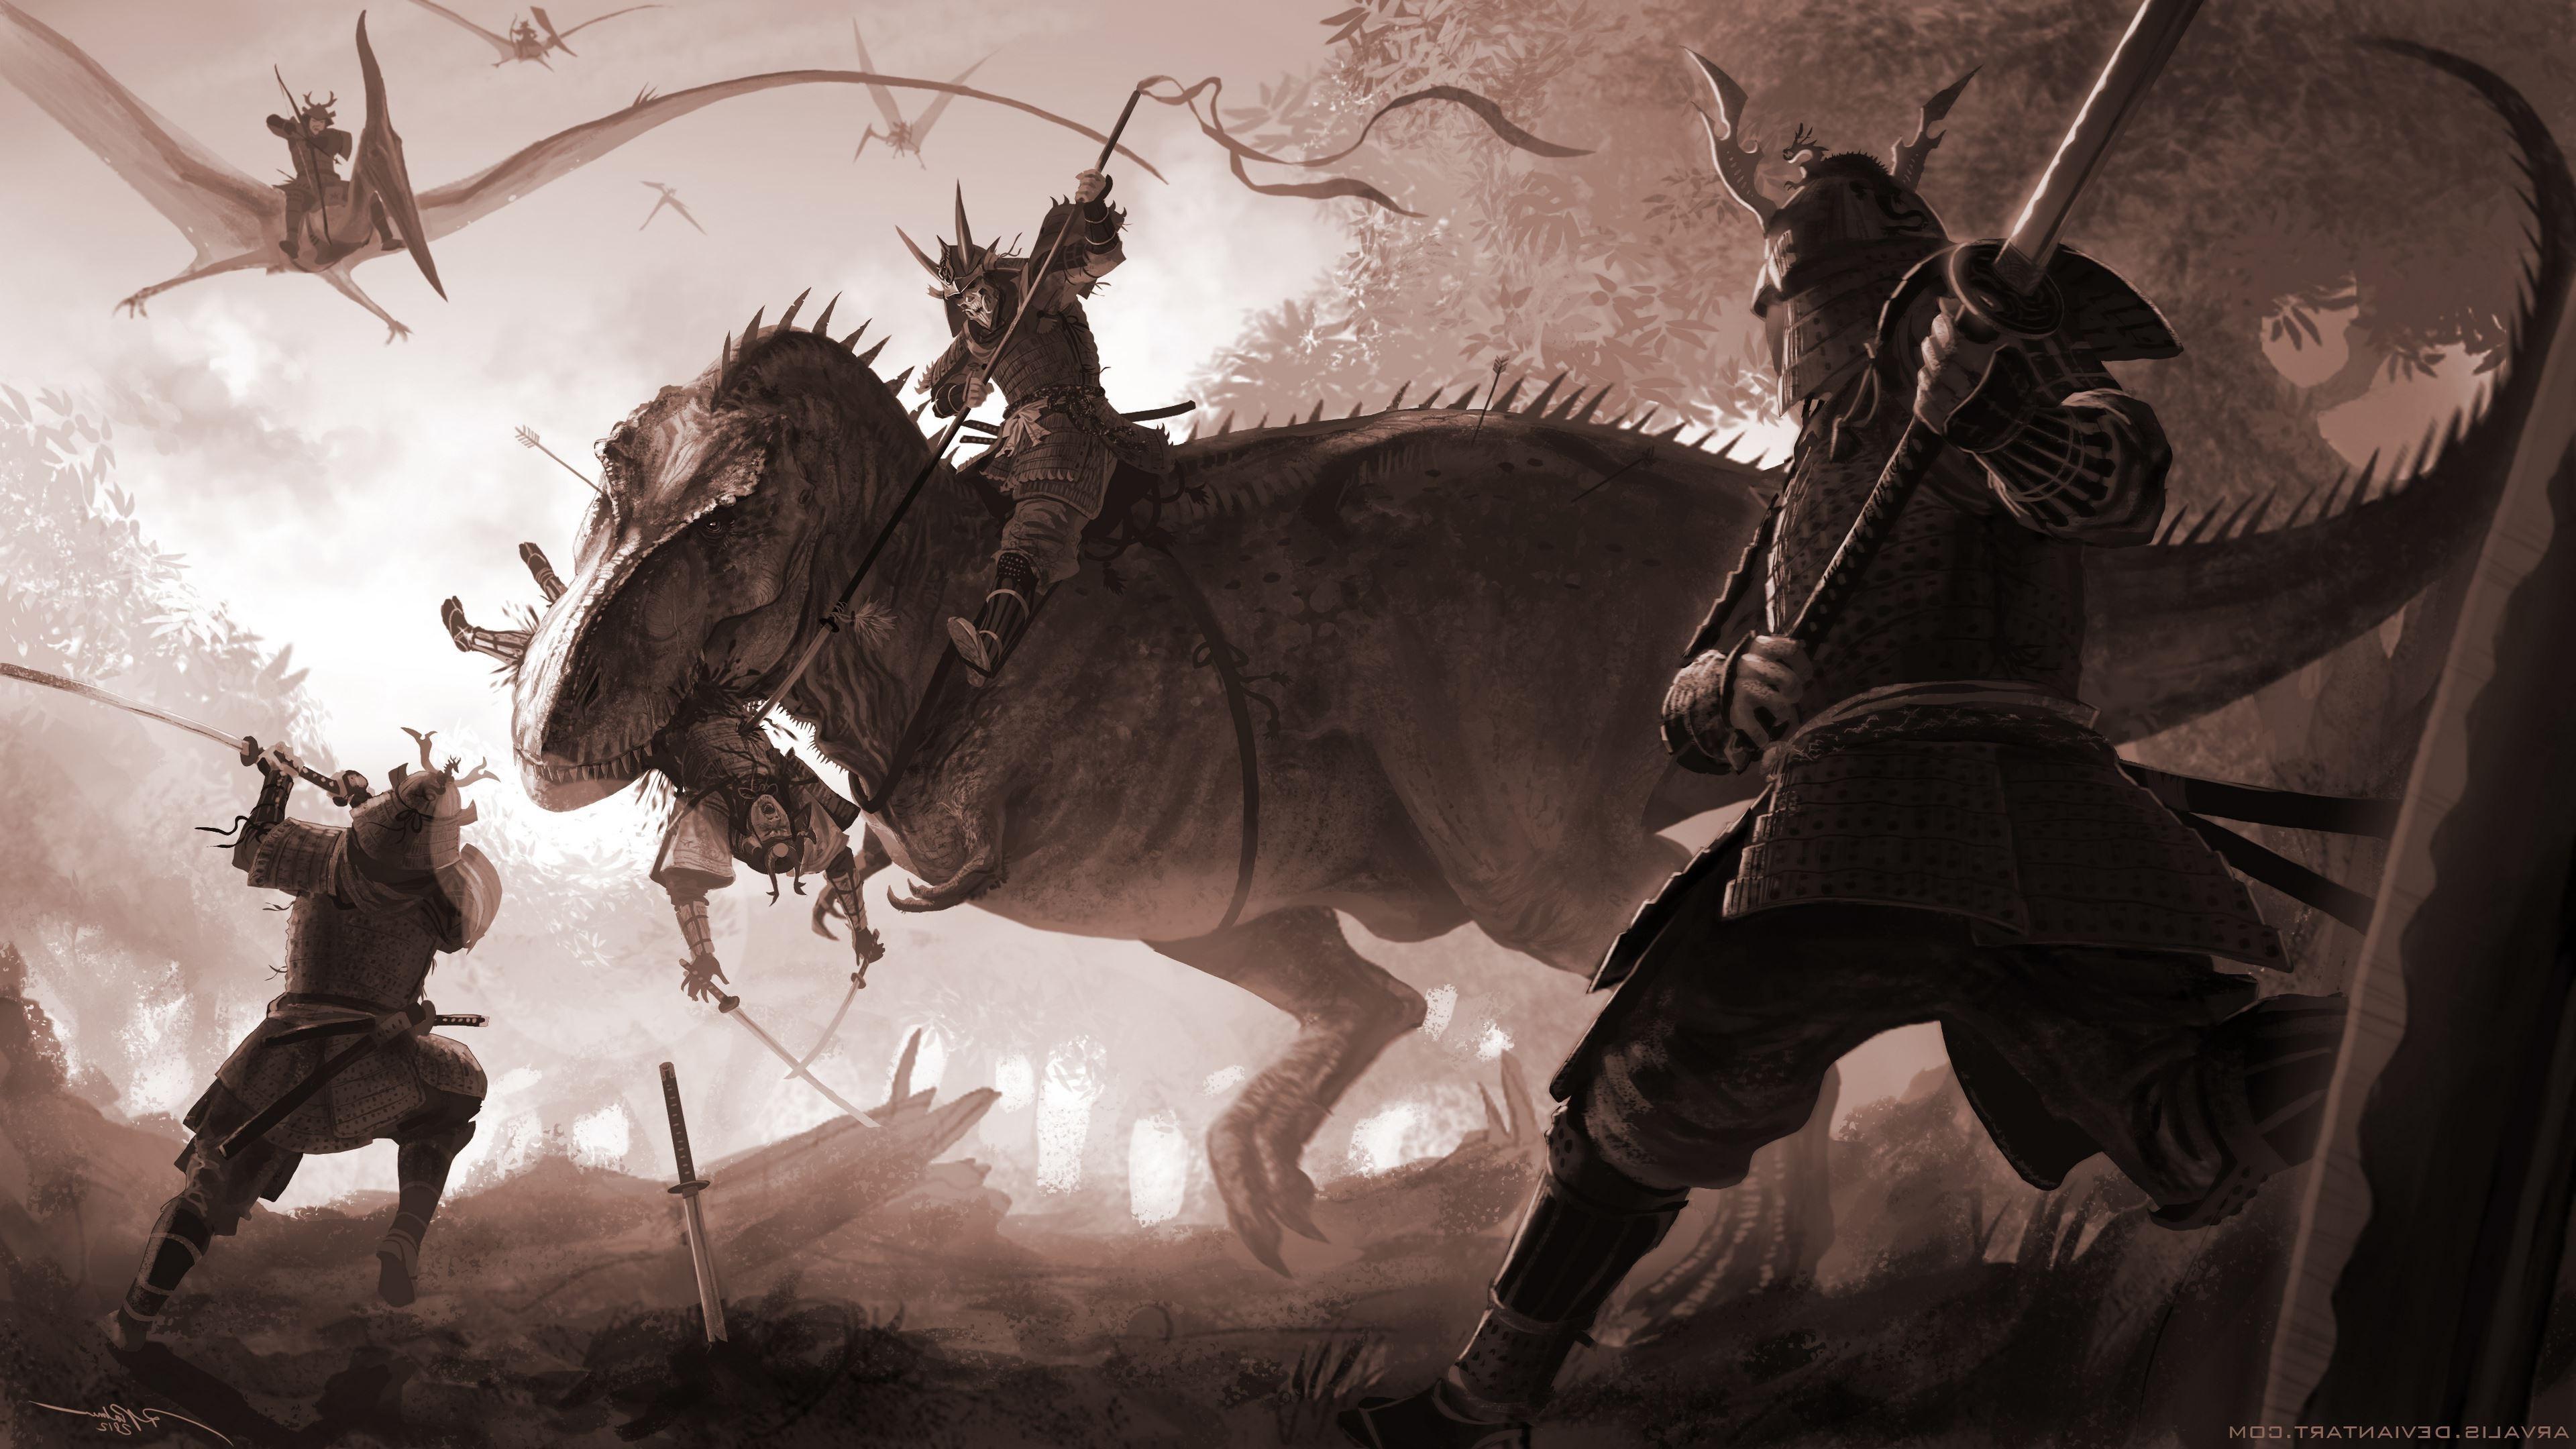 anime, Warrior, Fantasy Art Wallpapers HD / Desktop and Mobile Backgrounds